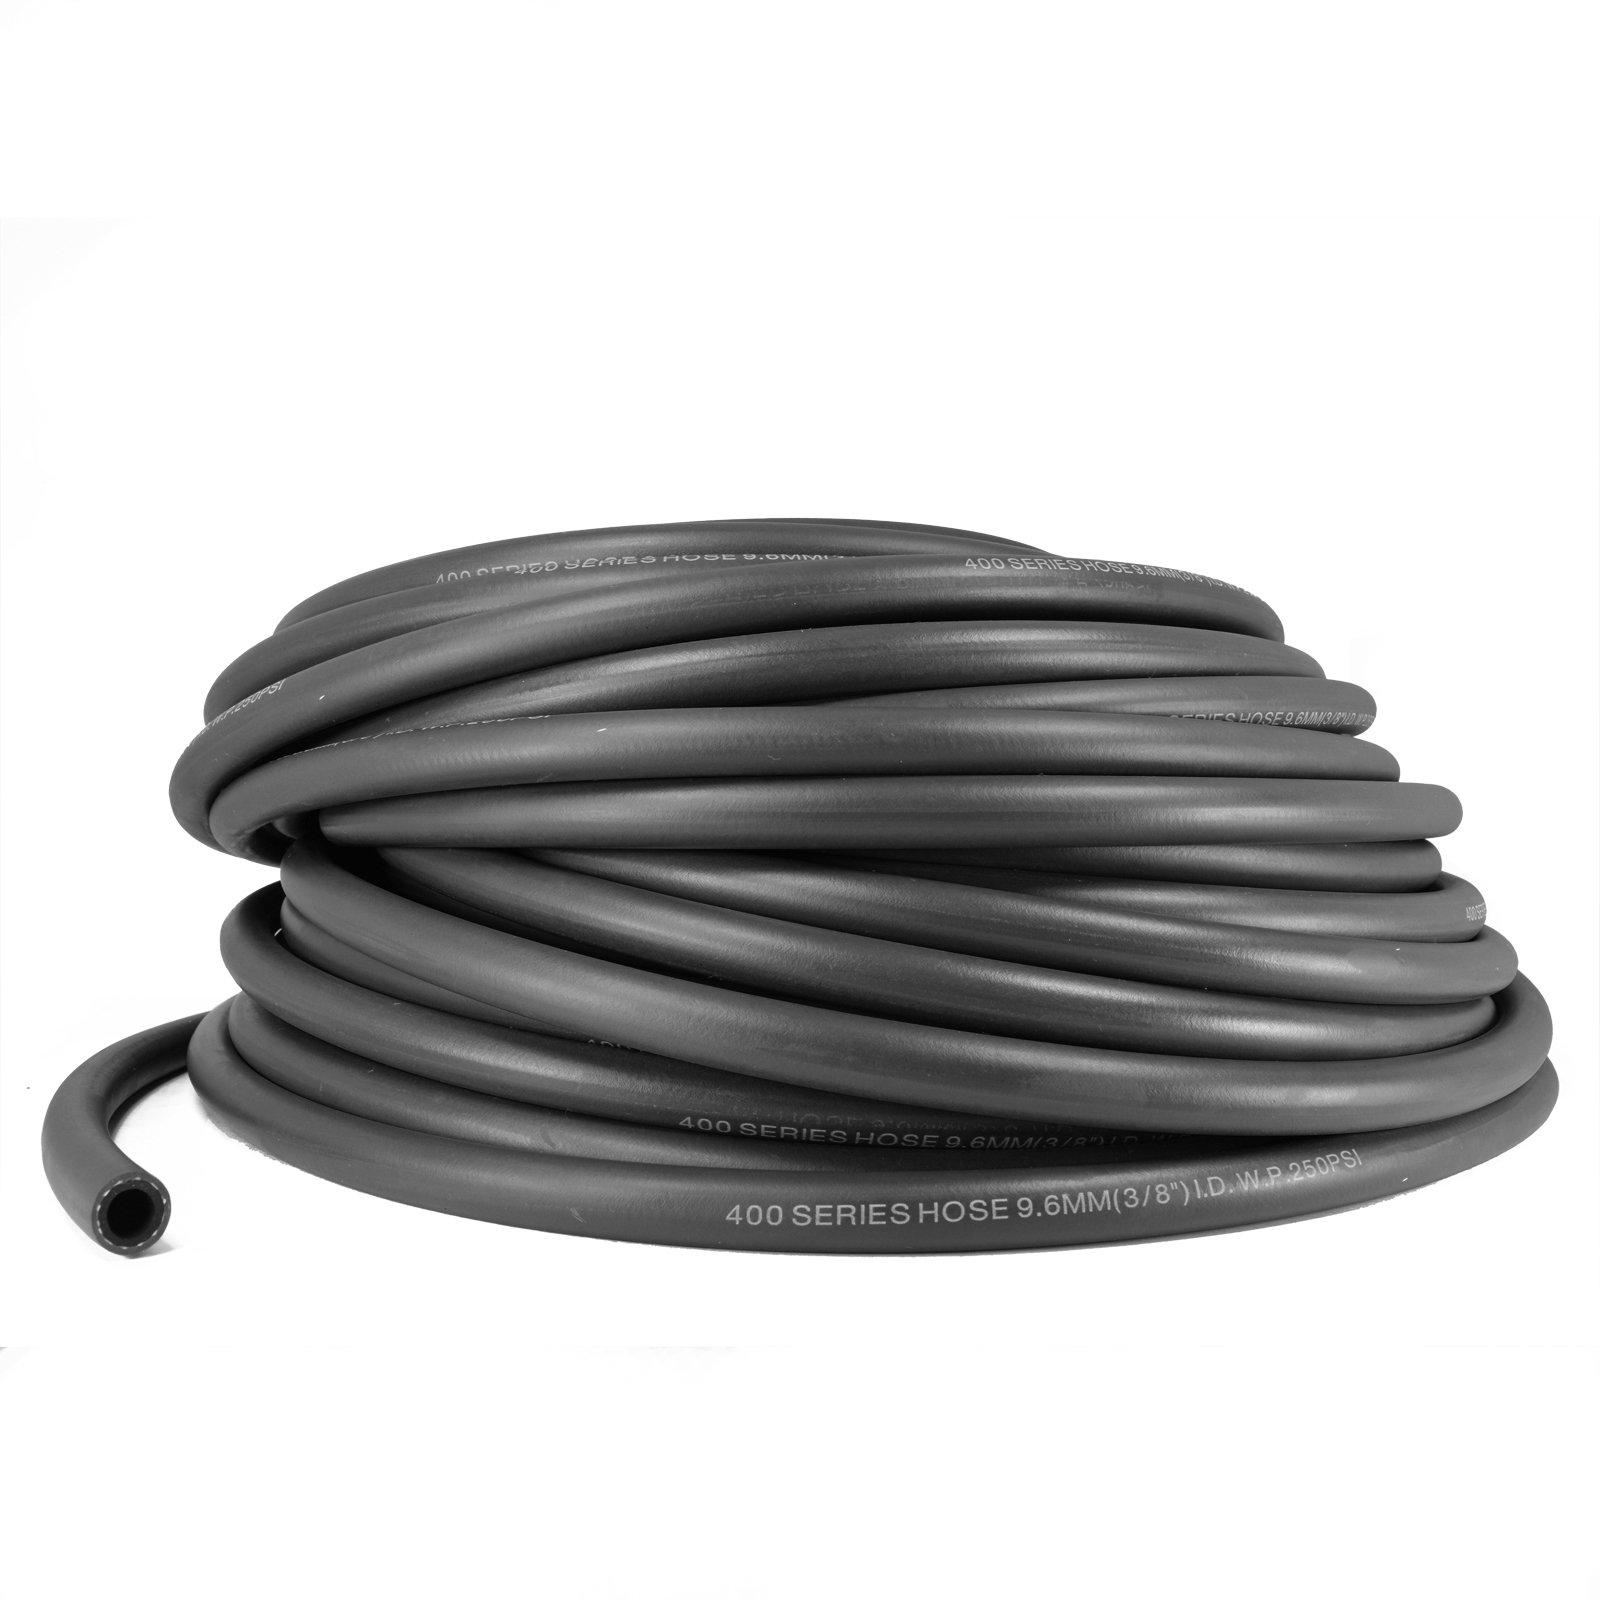 Kraken Automotive - 12AN Black Push Lock Hose for Fuel Oil Coolant Air 3/4'' (20 Feet)